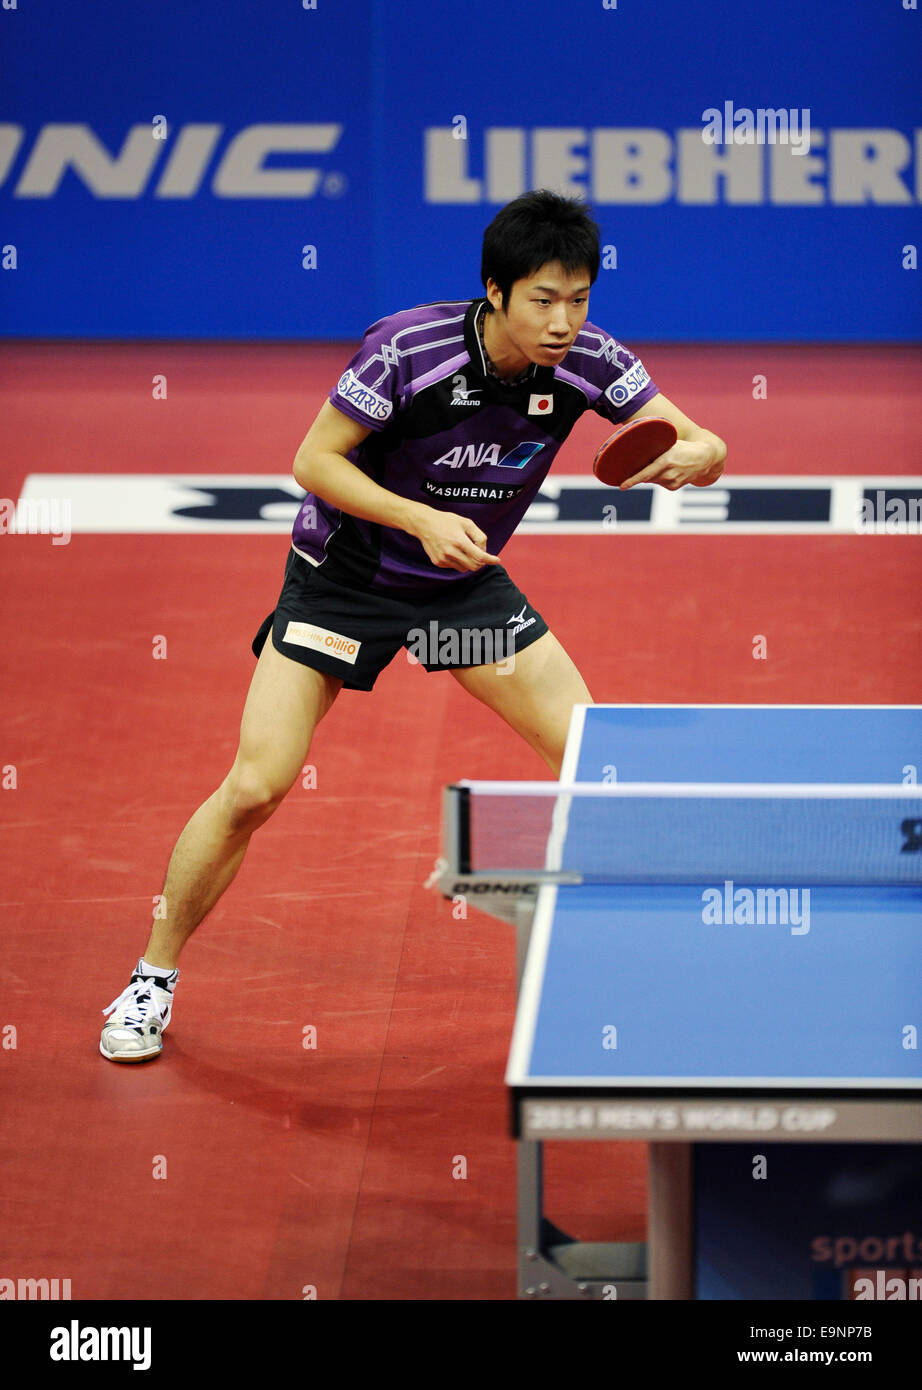 ISS Arena Duesseldorf, Germania 16.10.2014, Liebherr Ping pong World Cup , Jun Mizutanio (JPN) Immagini Stock